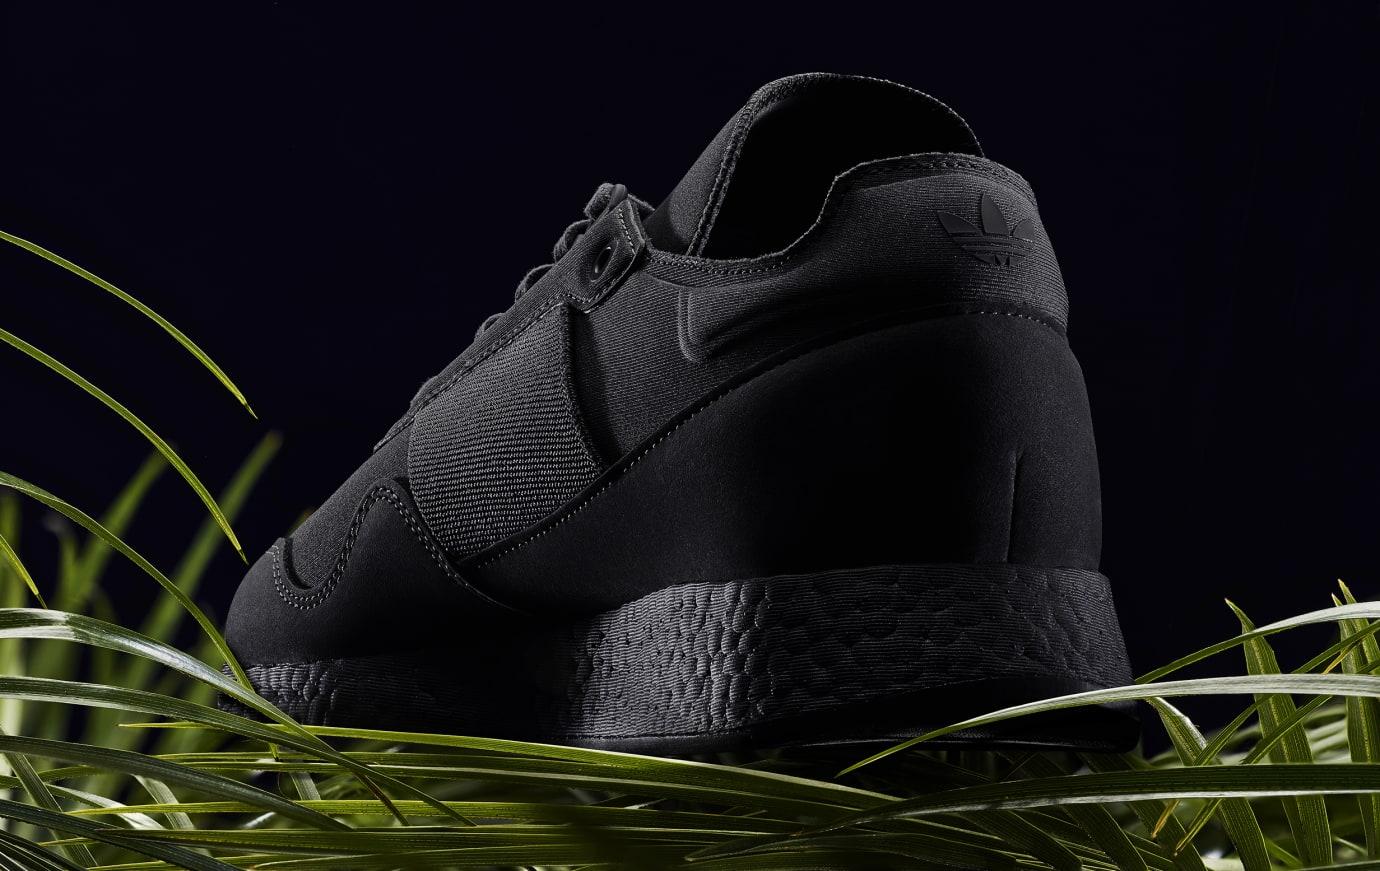 Daniel Arsham x Adidas New York Present DB1971 (Heel)